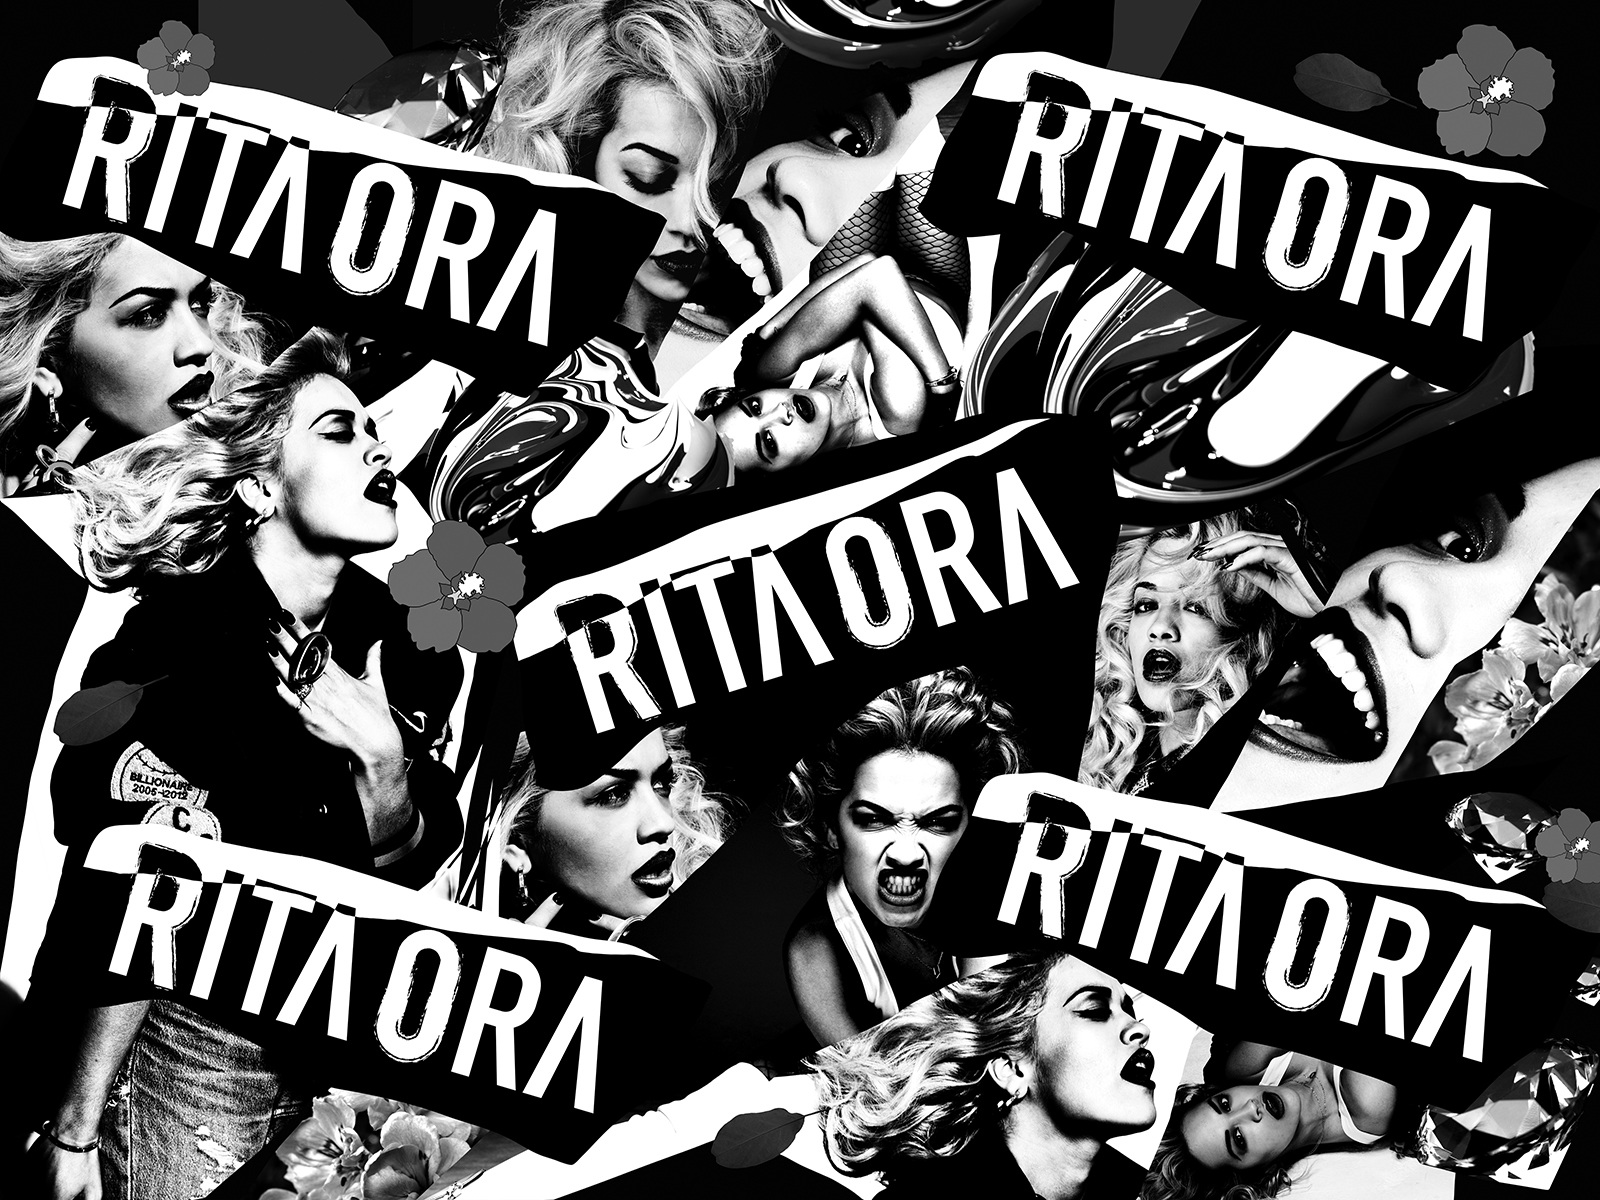 Rita Ora festival backdrop